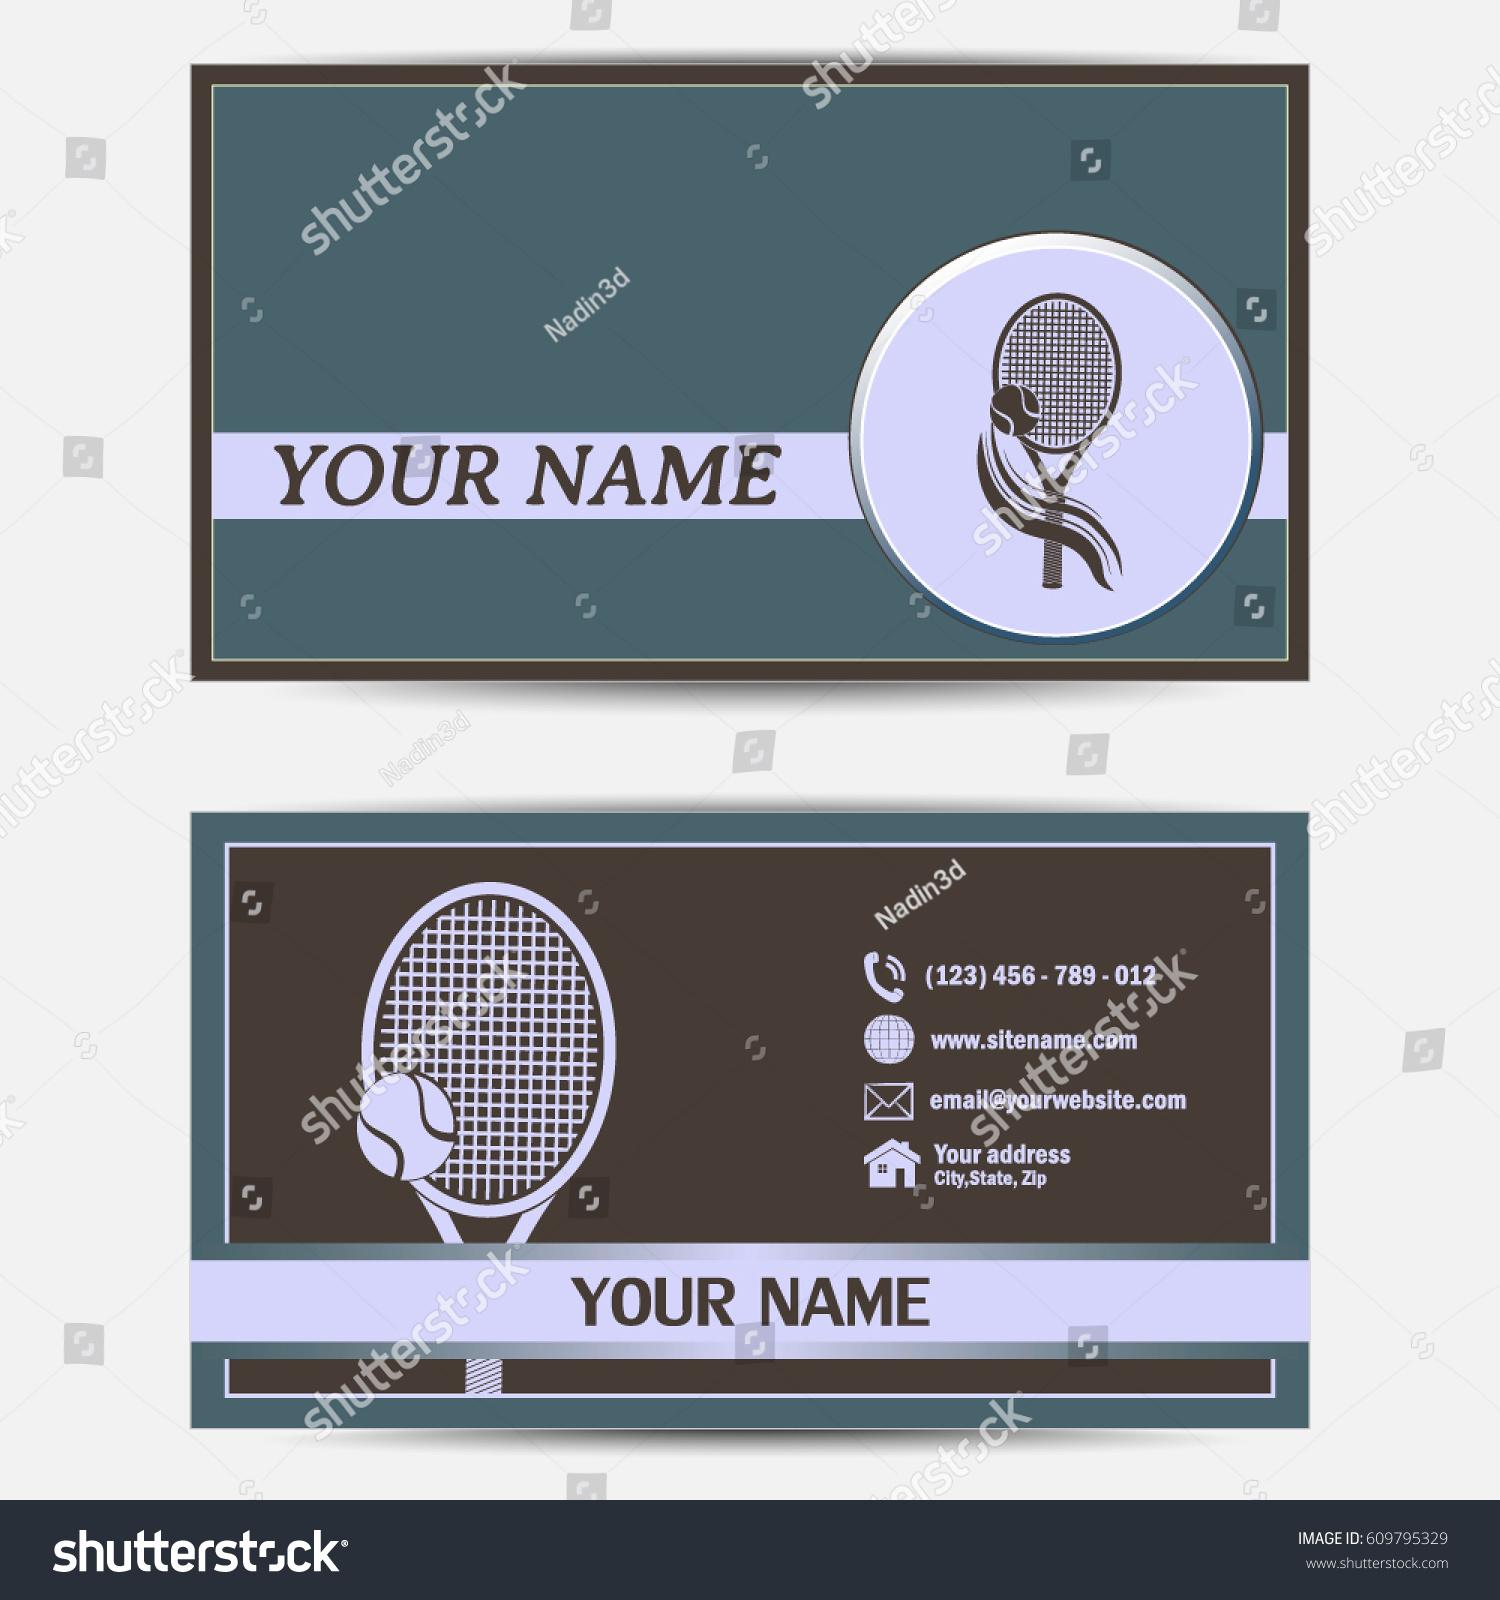 Business Cards Design Vector Illustrationtennis Club Stock Vector ...